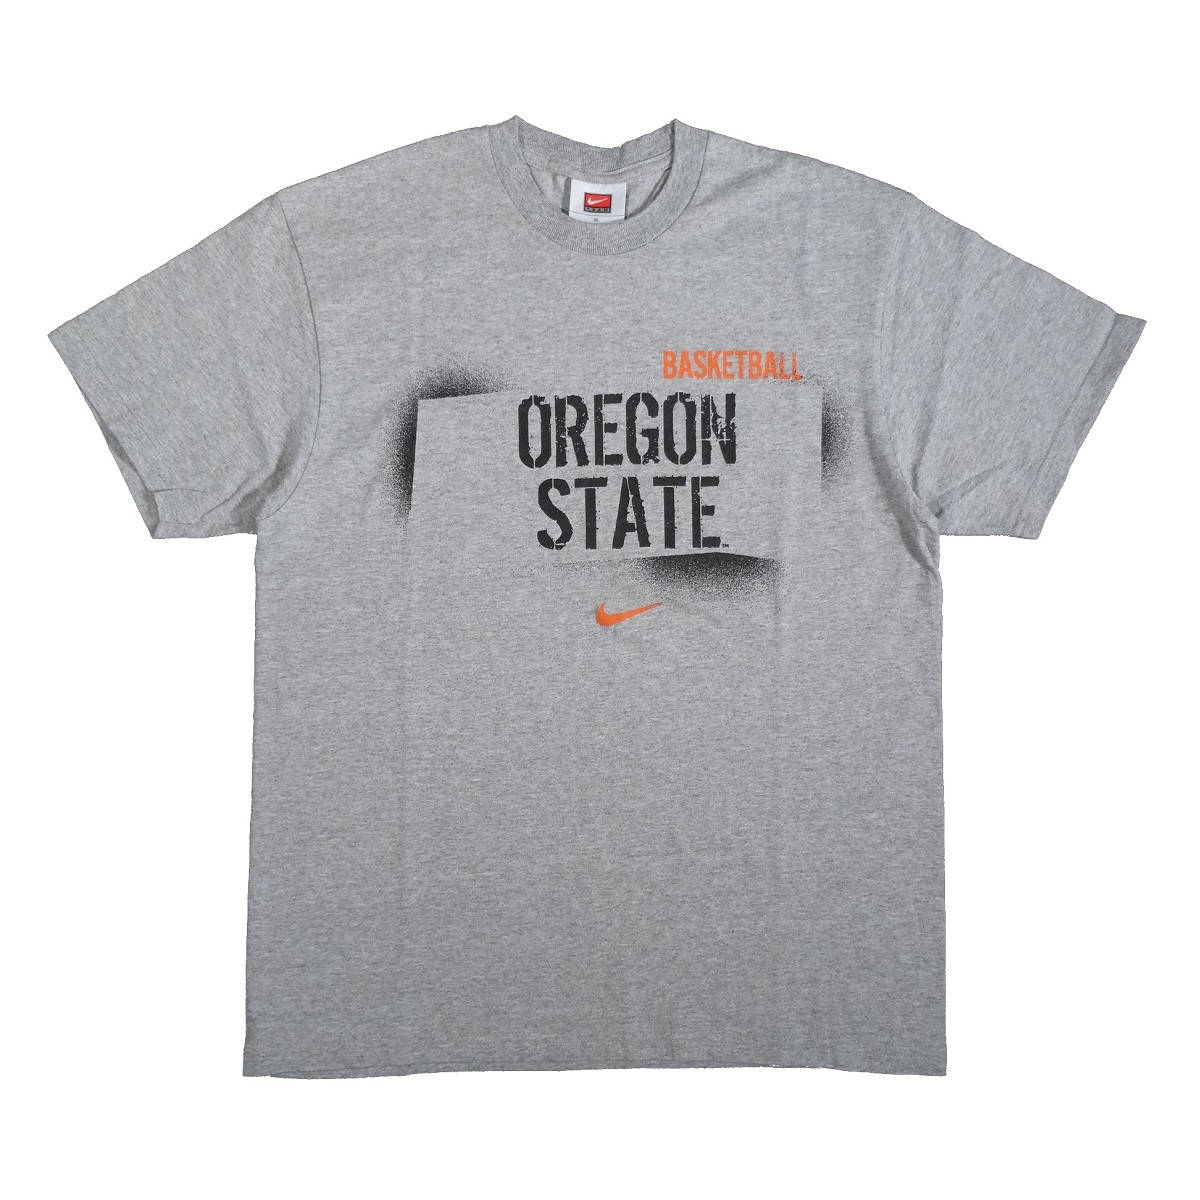 Oregon State Beavers Basketball Nike Just Do It T Shirt Front